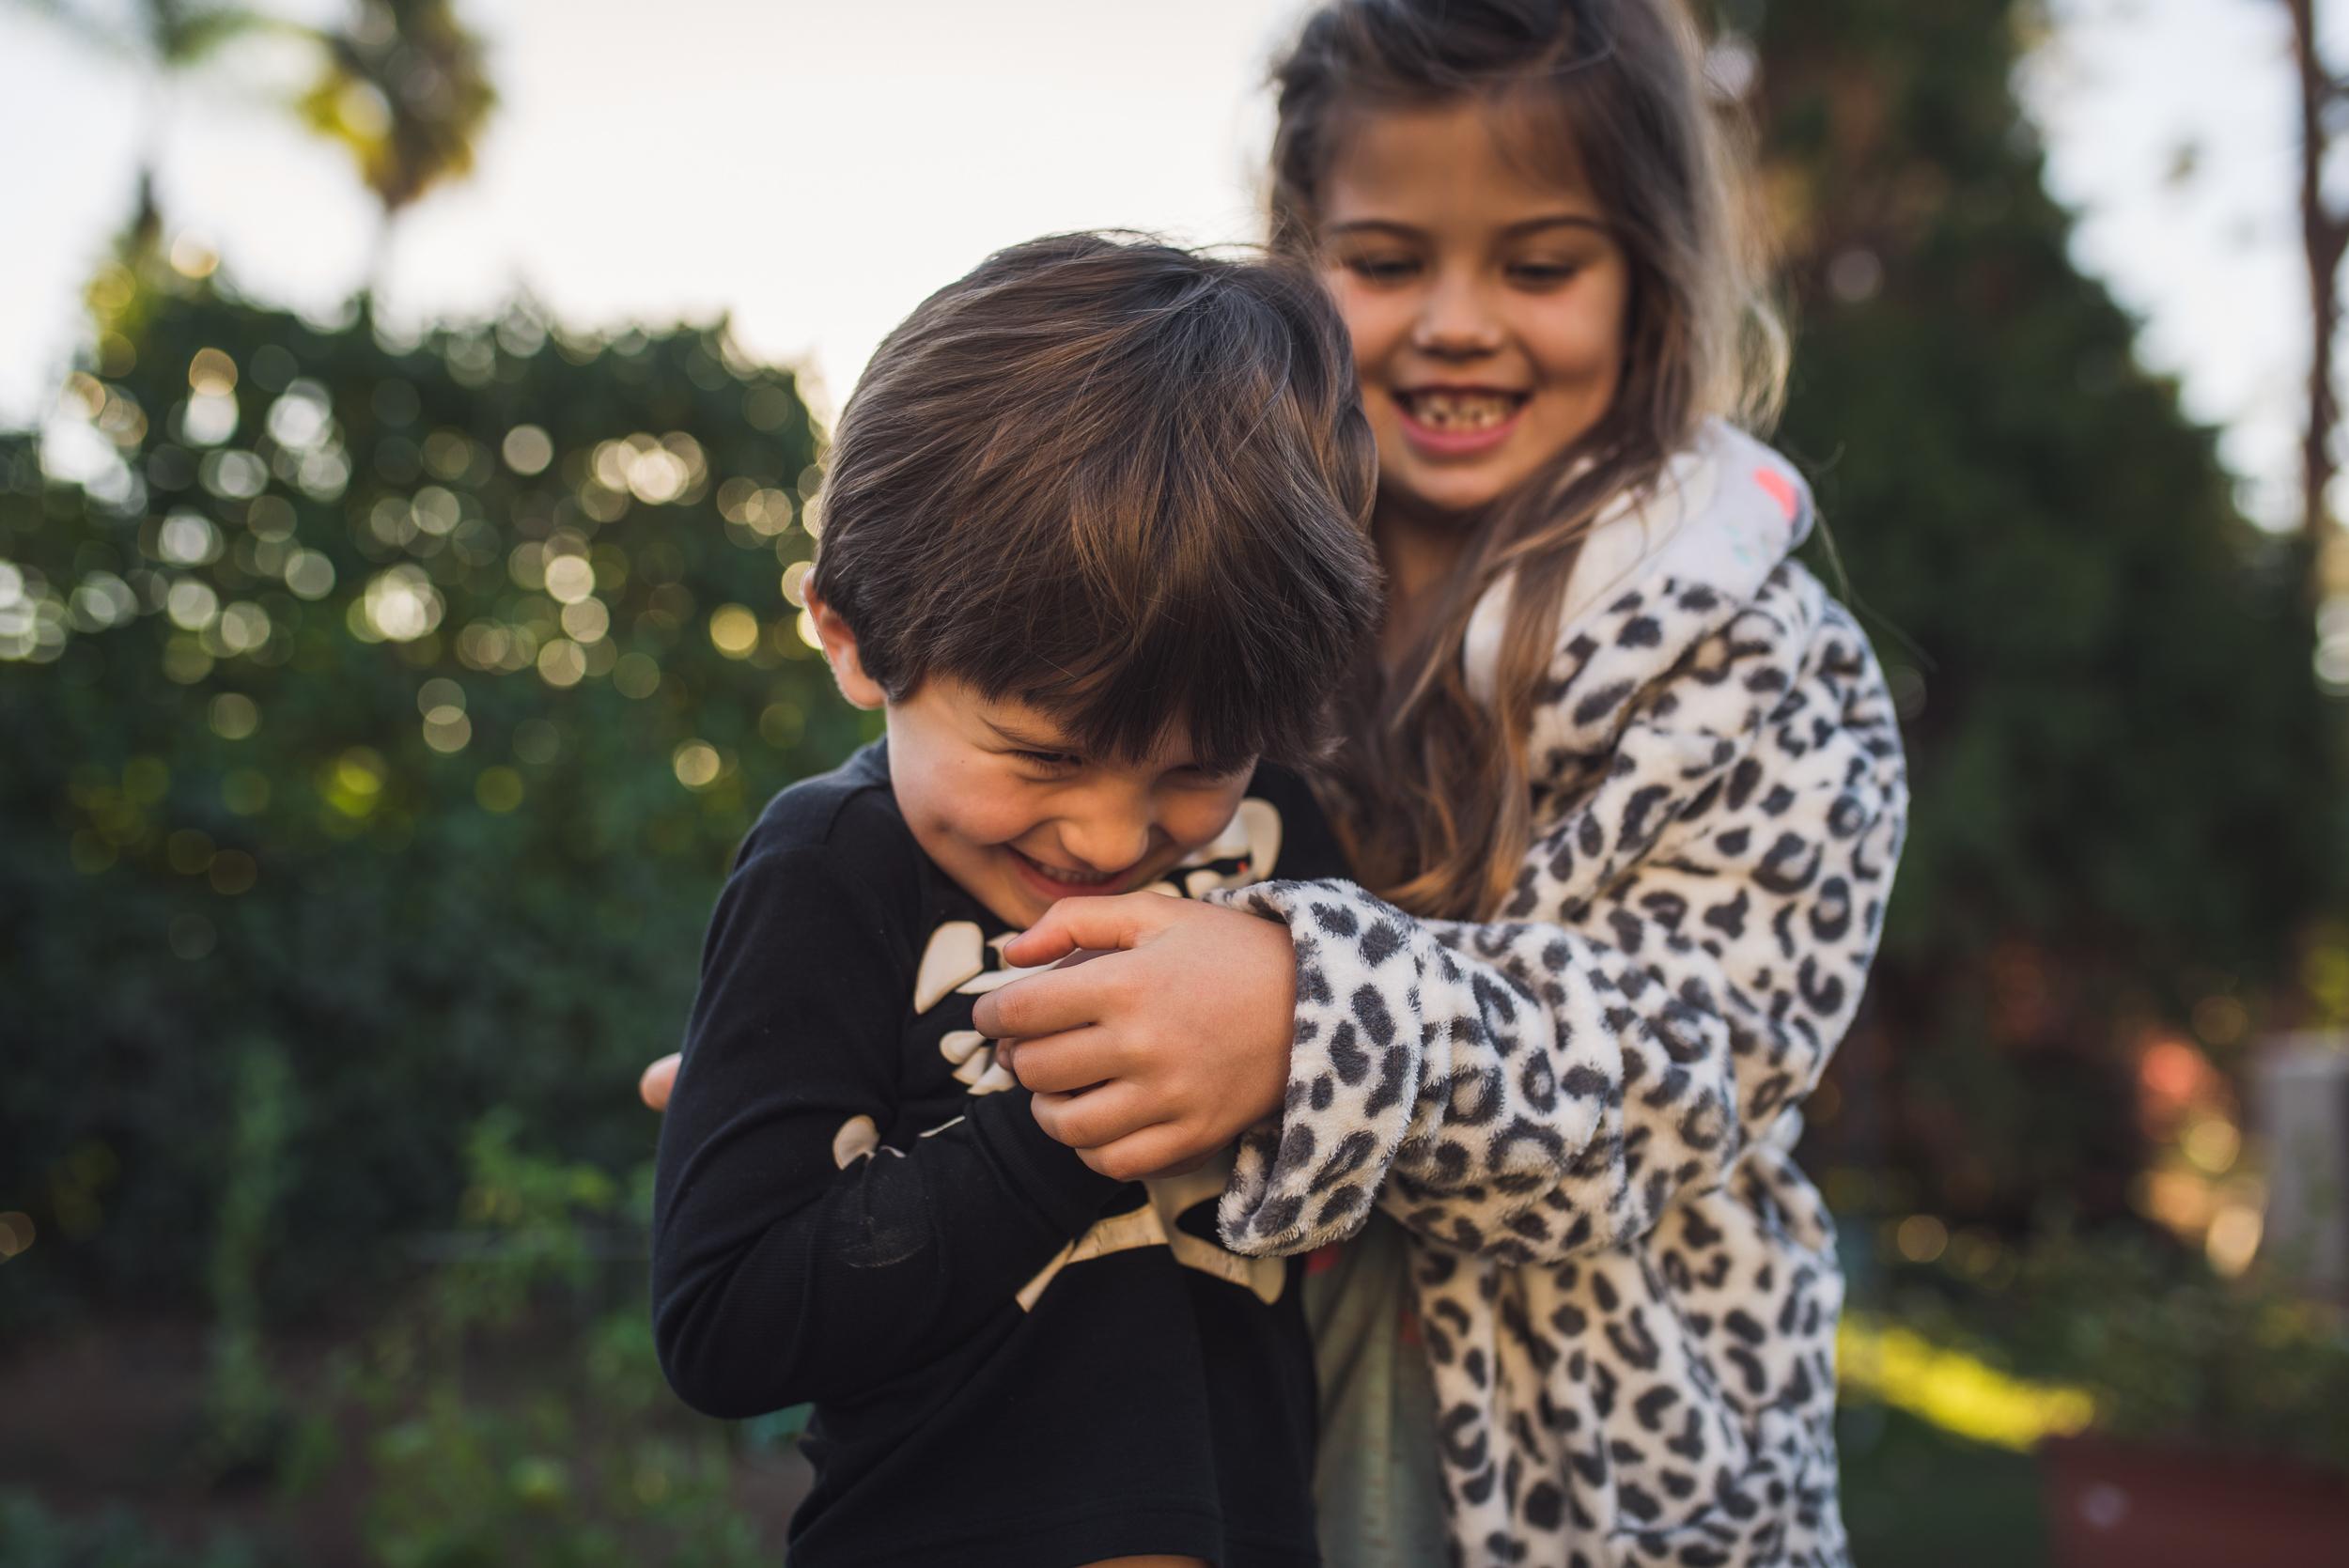 2018-San-Diego-Family-Lifestyle-Newborn-Travel-Vacation-Photographer-Kelsey-Smith-Photography-Coronado-La-Jolla-Encinitas-Solana-Beach-Del-Mar-274.jpg